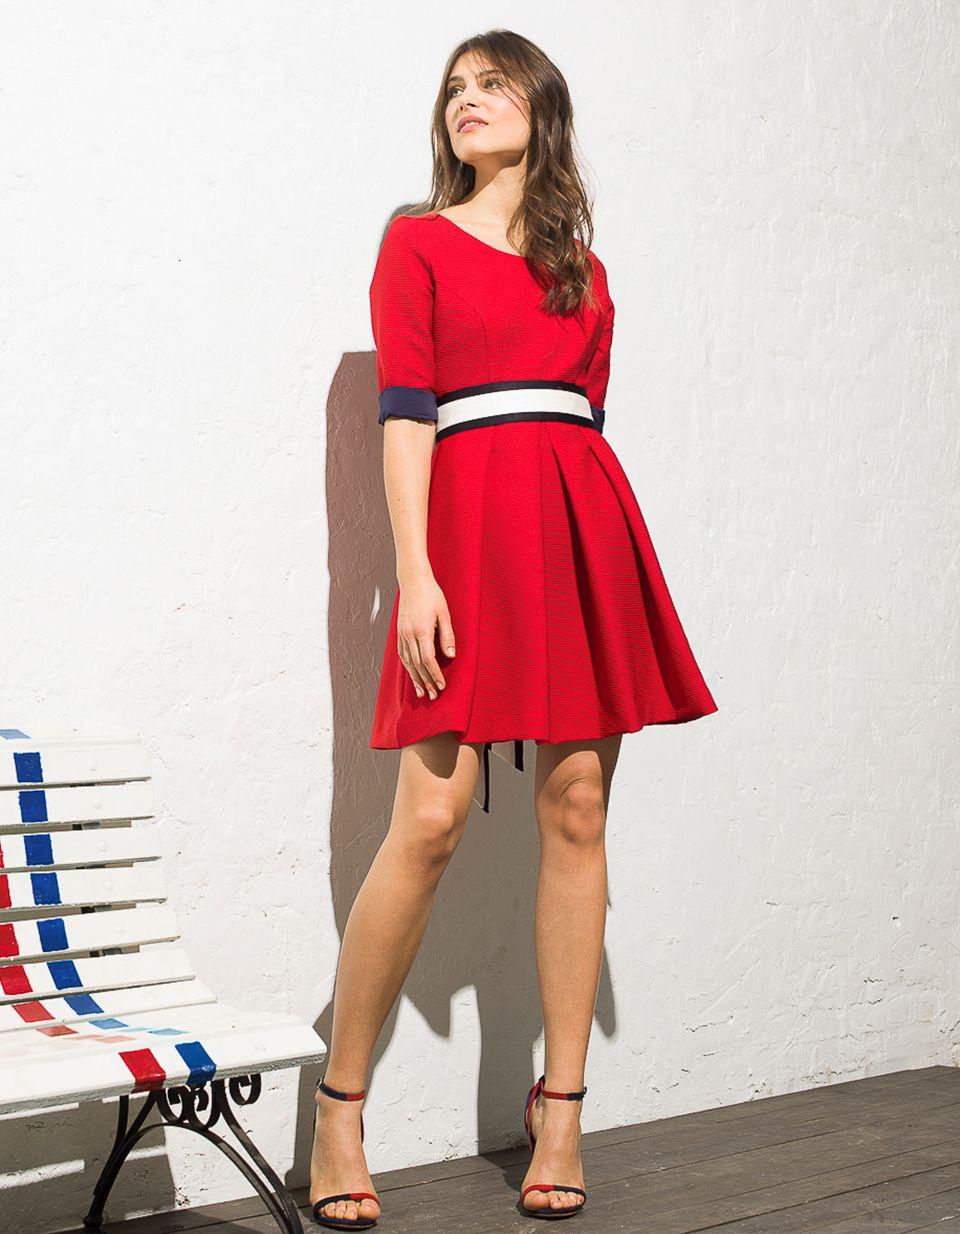 Vestido Store Rojo Ganso Mujer Lookbook Ganso Online Diy El rB0qwPr